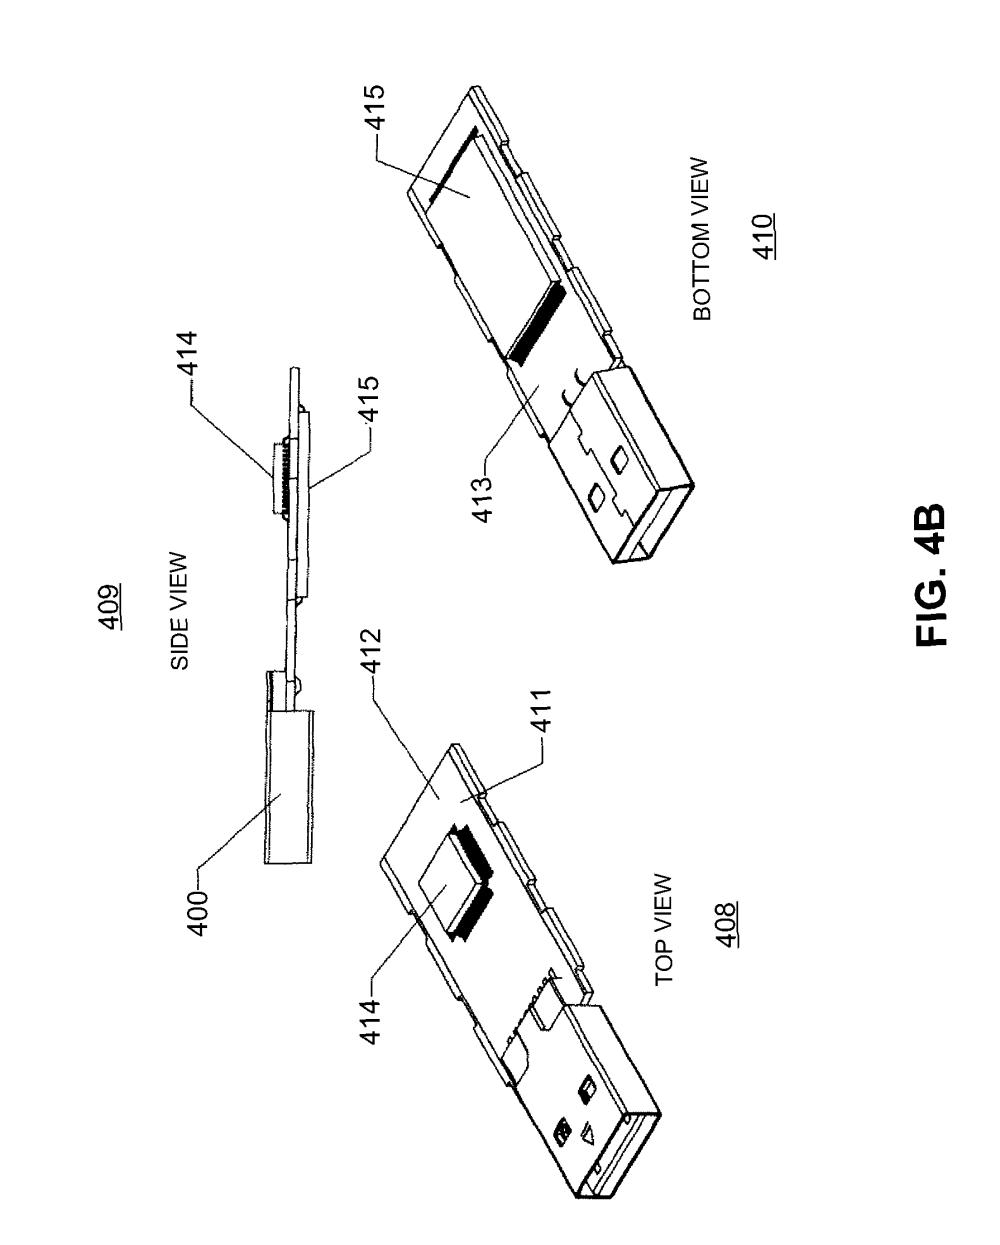 medium resolution of 451m relay wiring diagram 5 wire 3 pole relay diagram 451m relay trim fix dei 451m